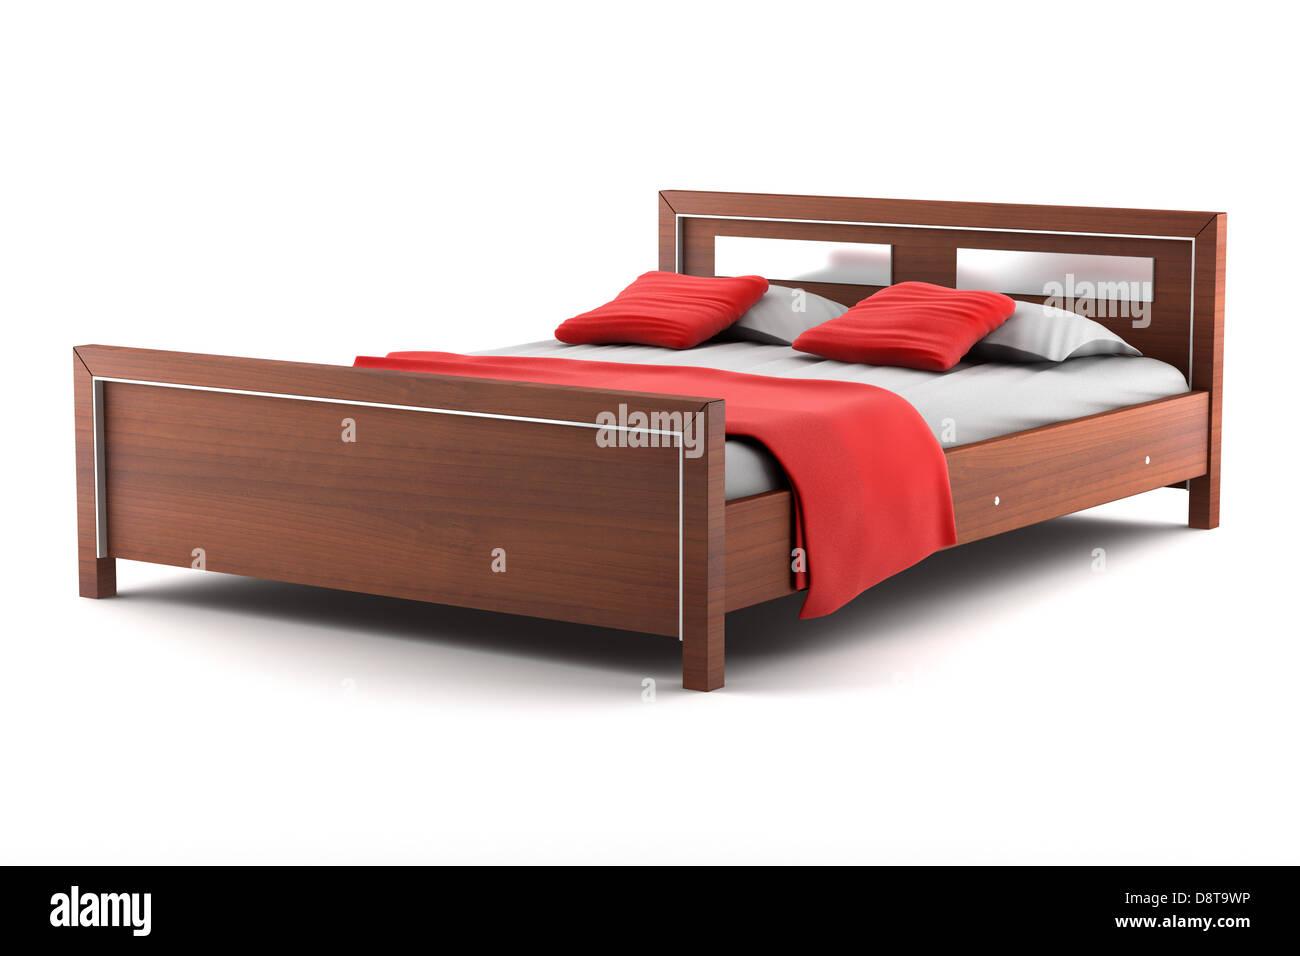 bed isolated on white background - Stock Image